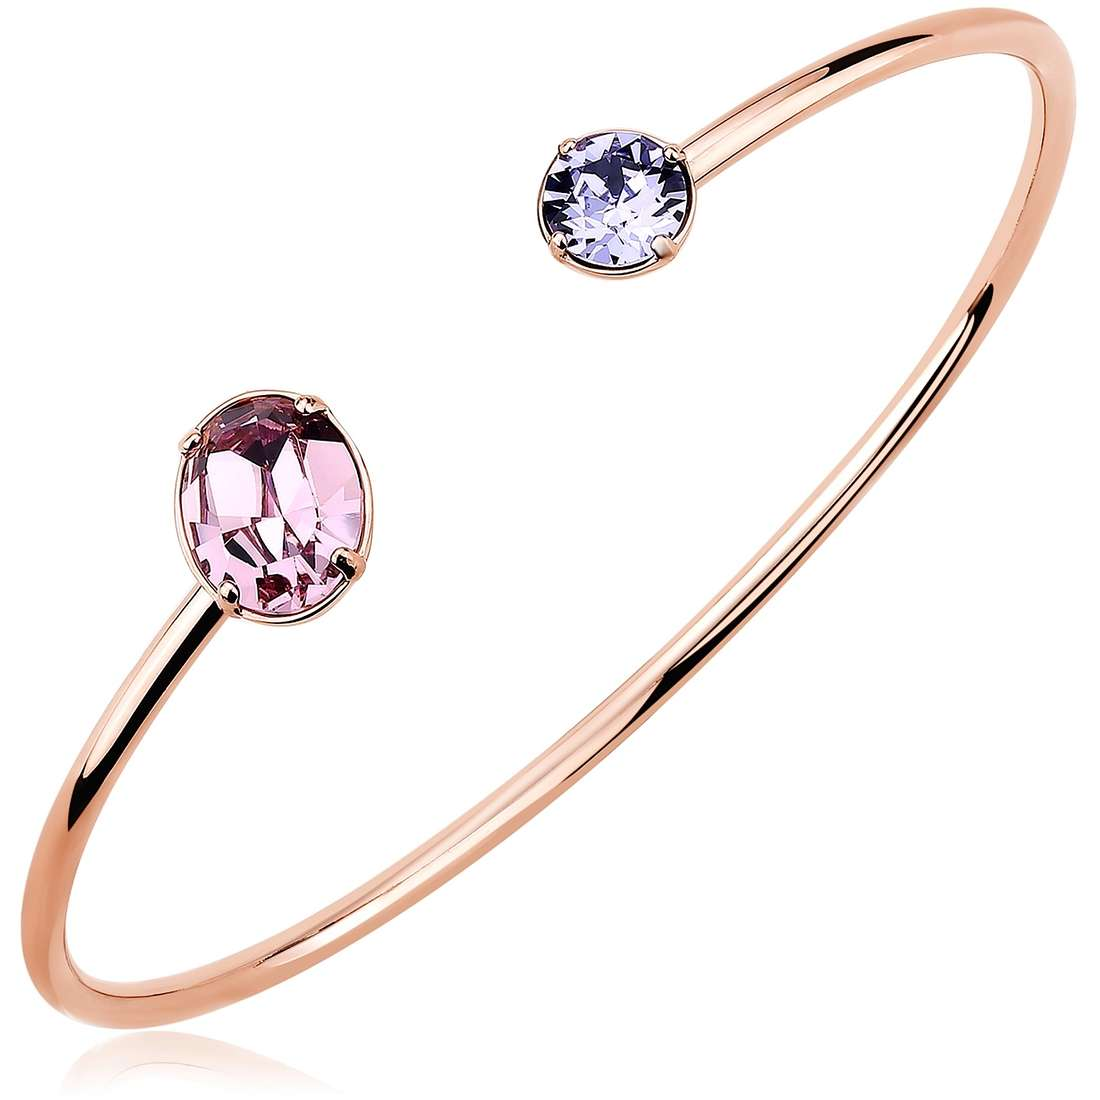 Bracciale Brosway Affinity pvd oro rosa e cristalli swarovski - Bracciali Torino